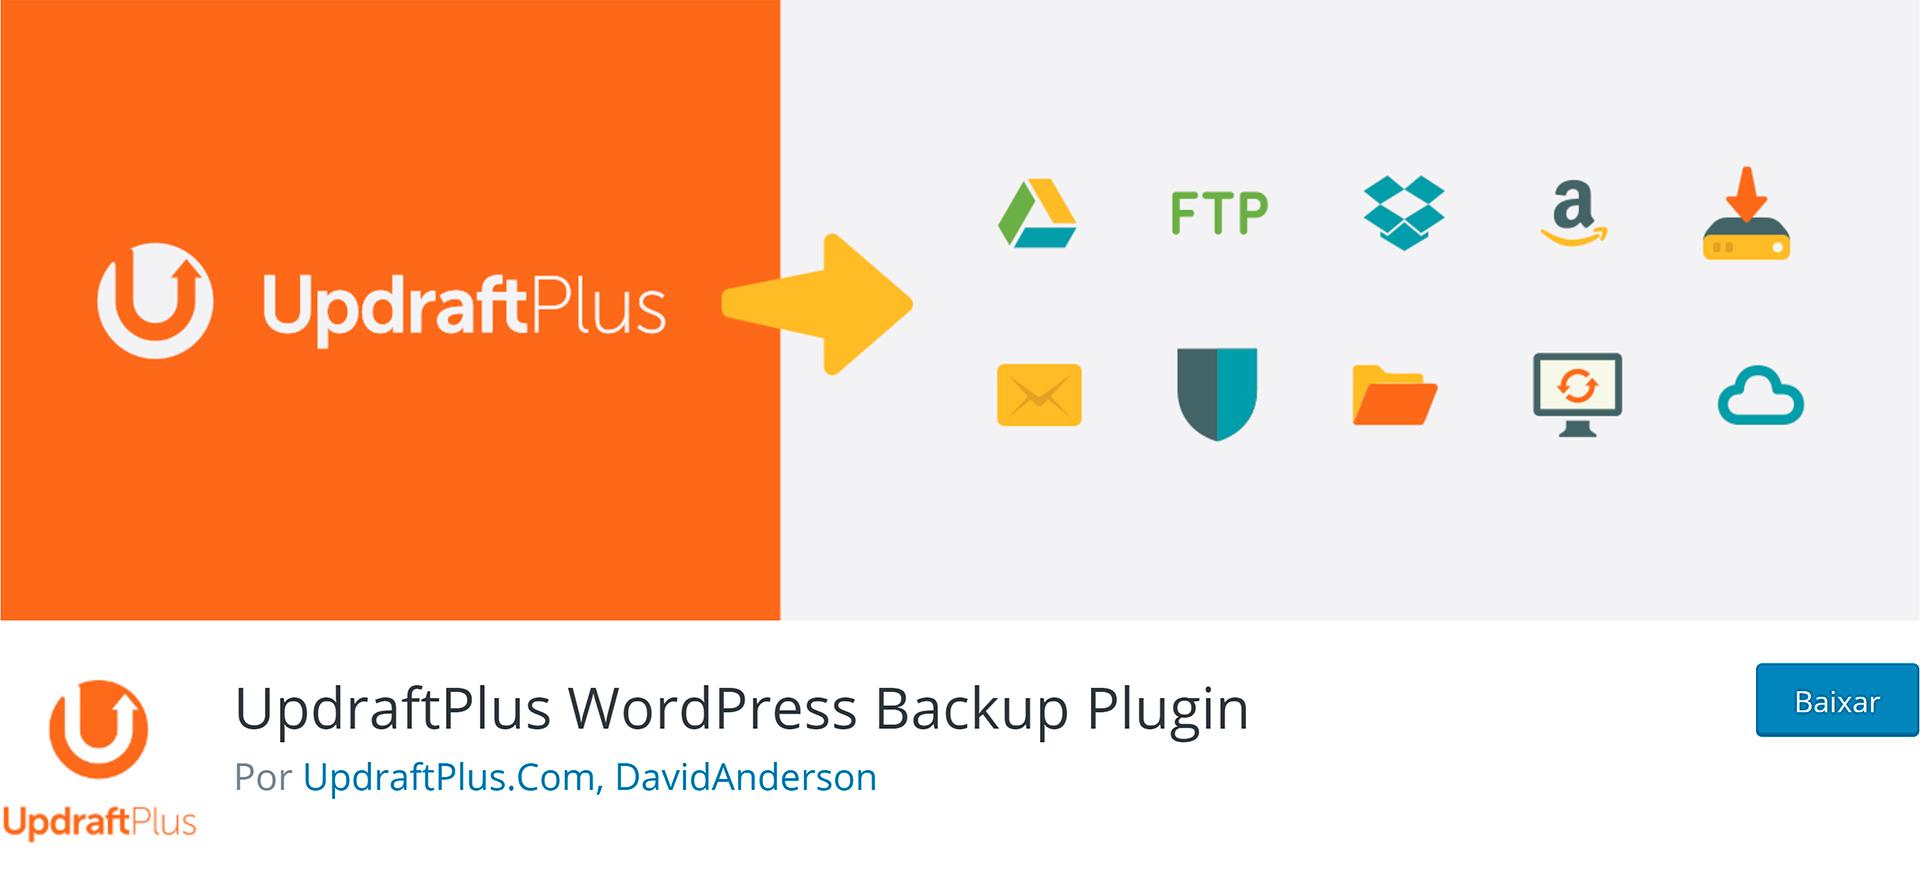 updraftplus backup plugin wordpress